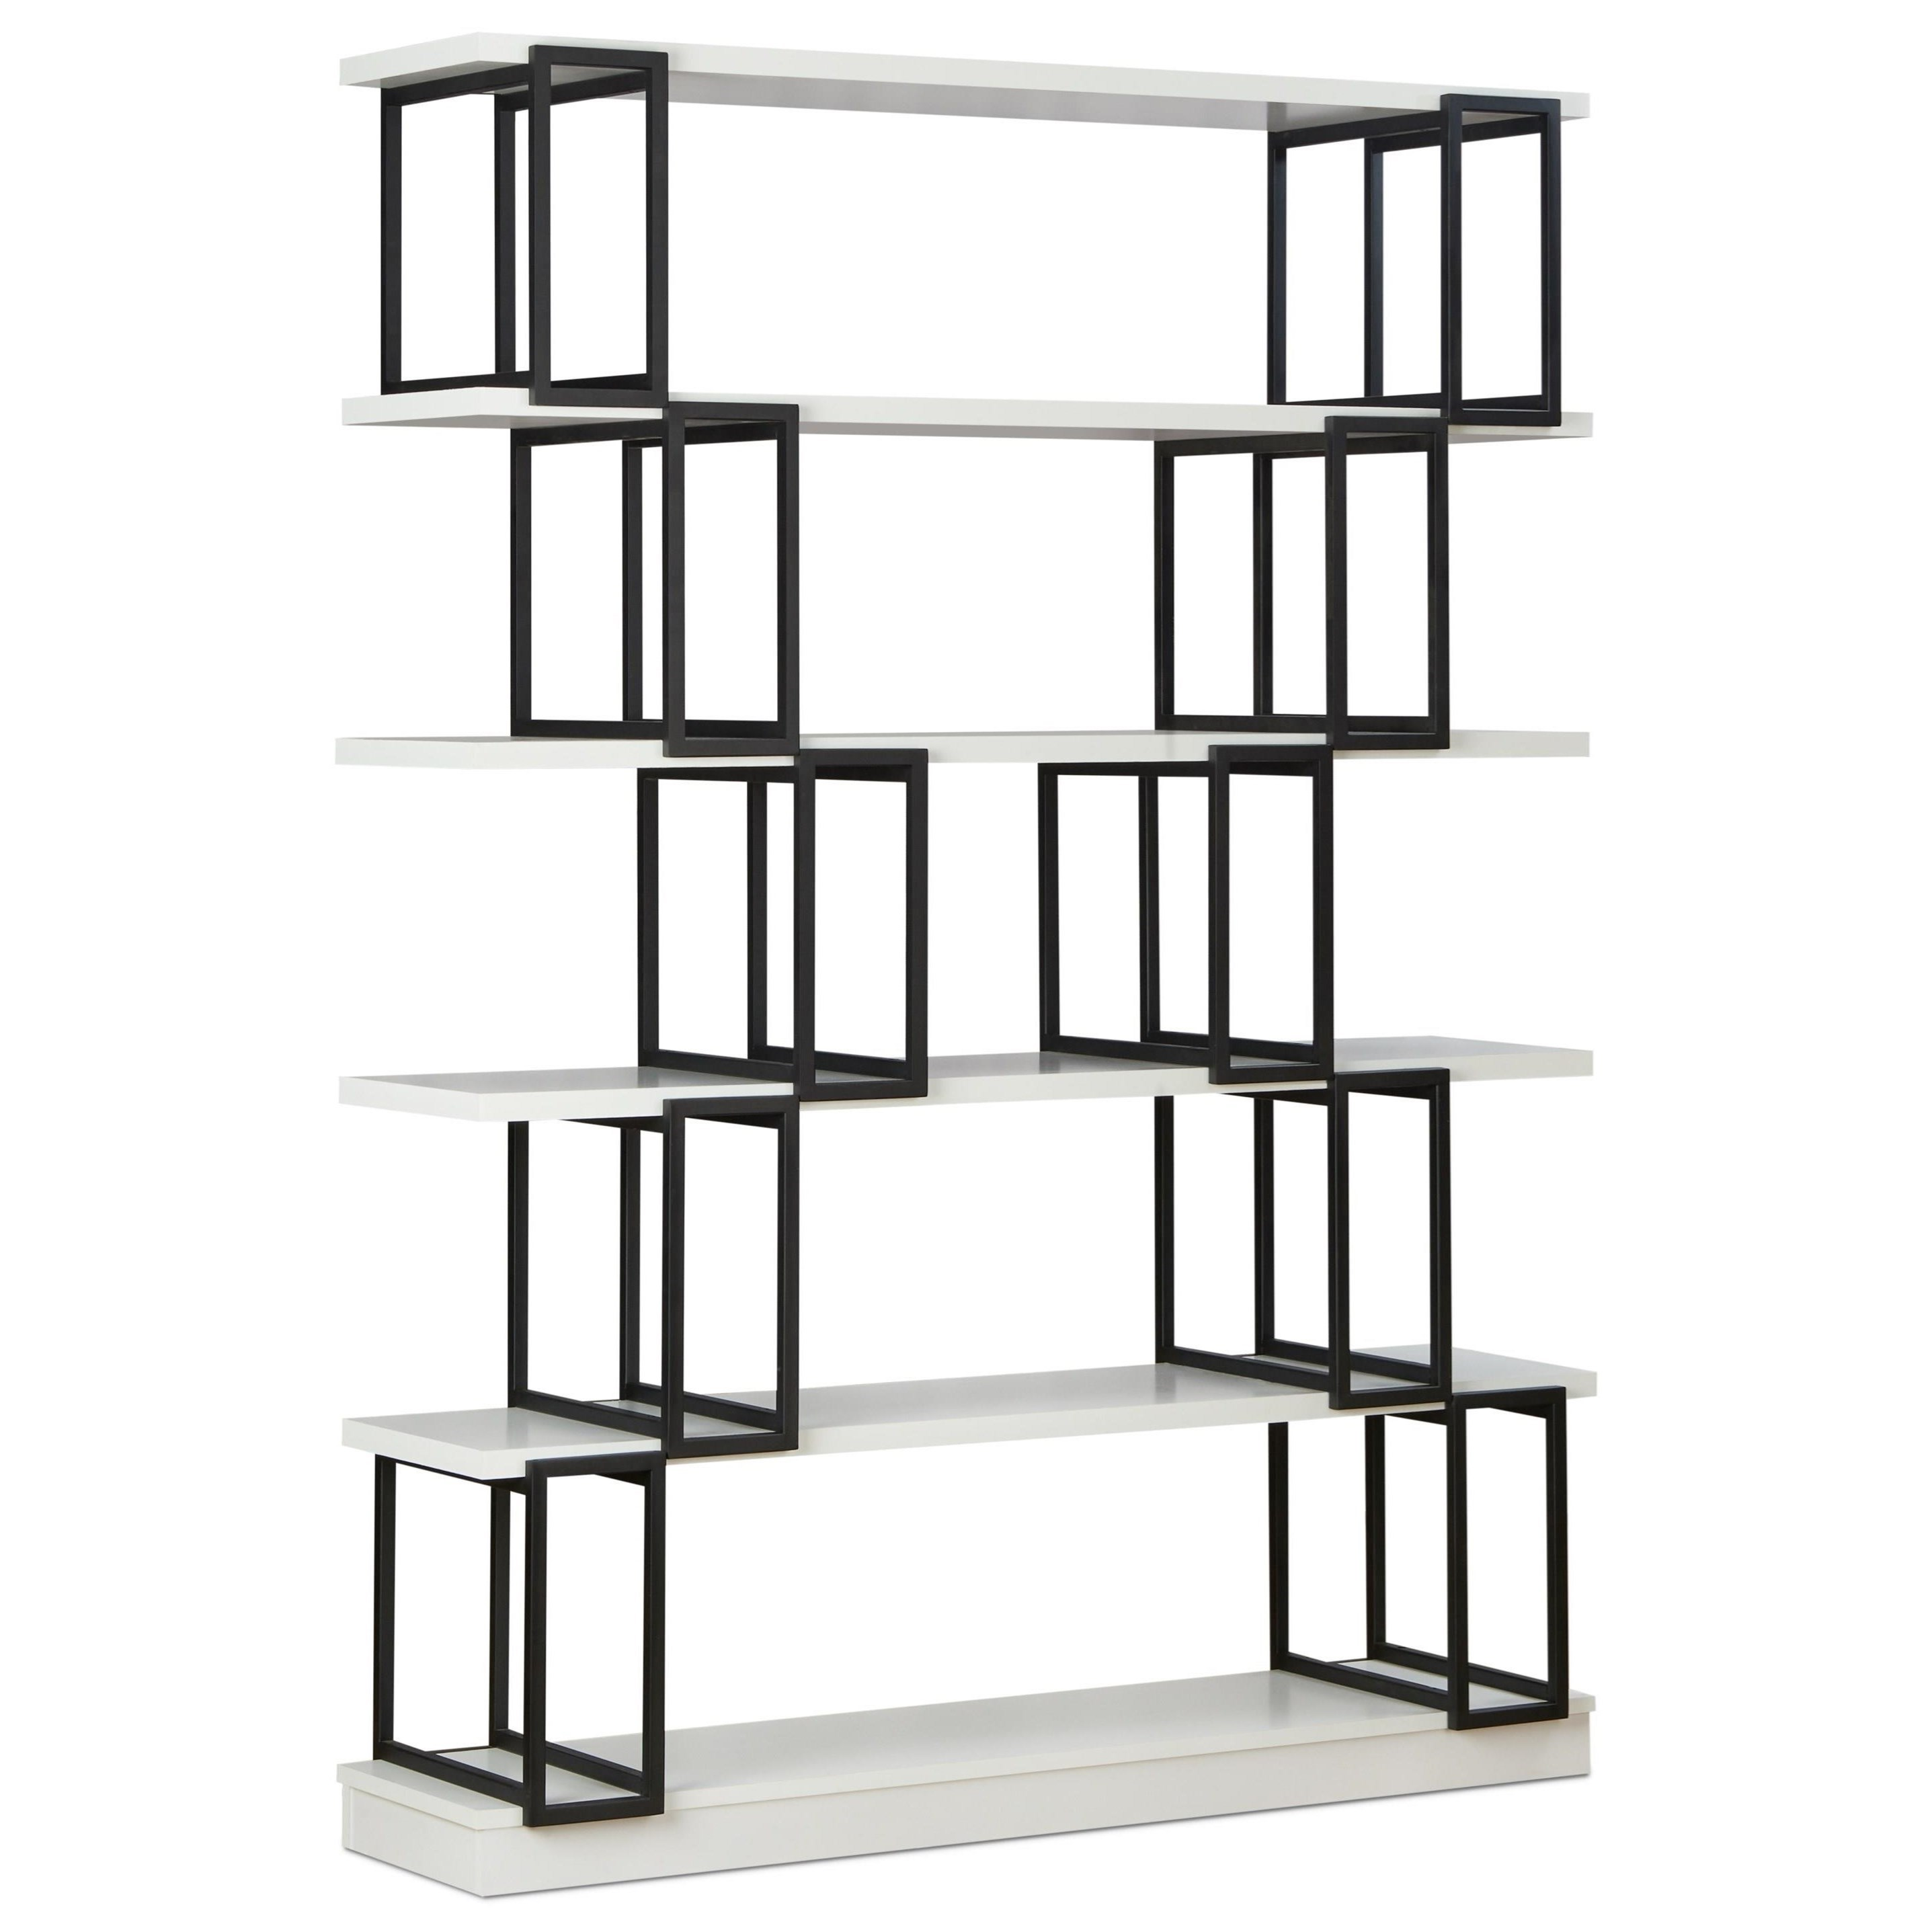 Verne Bookshelf by Acme Furniture at Carolina Direct